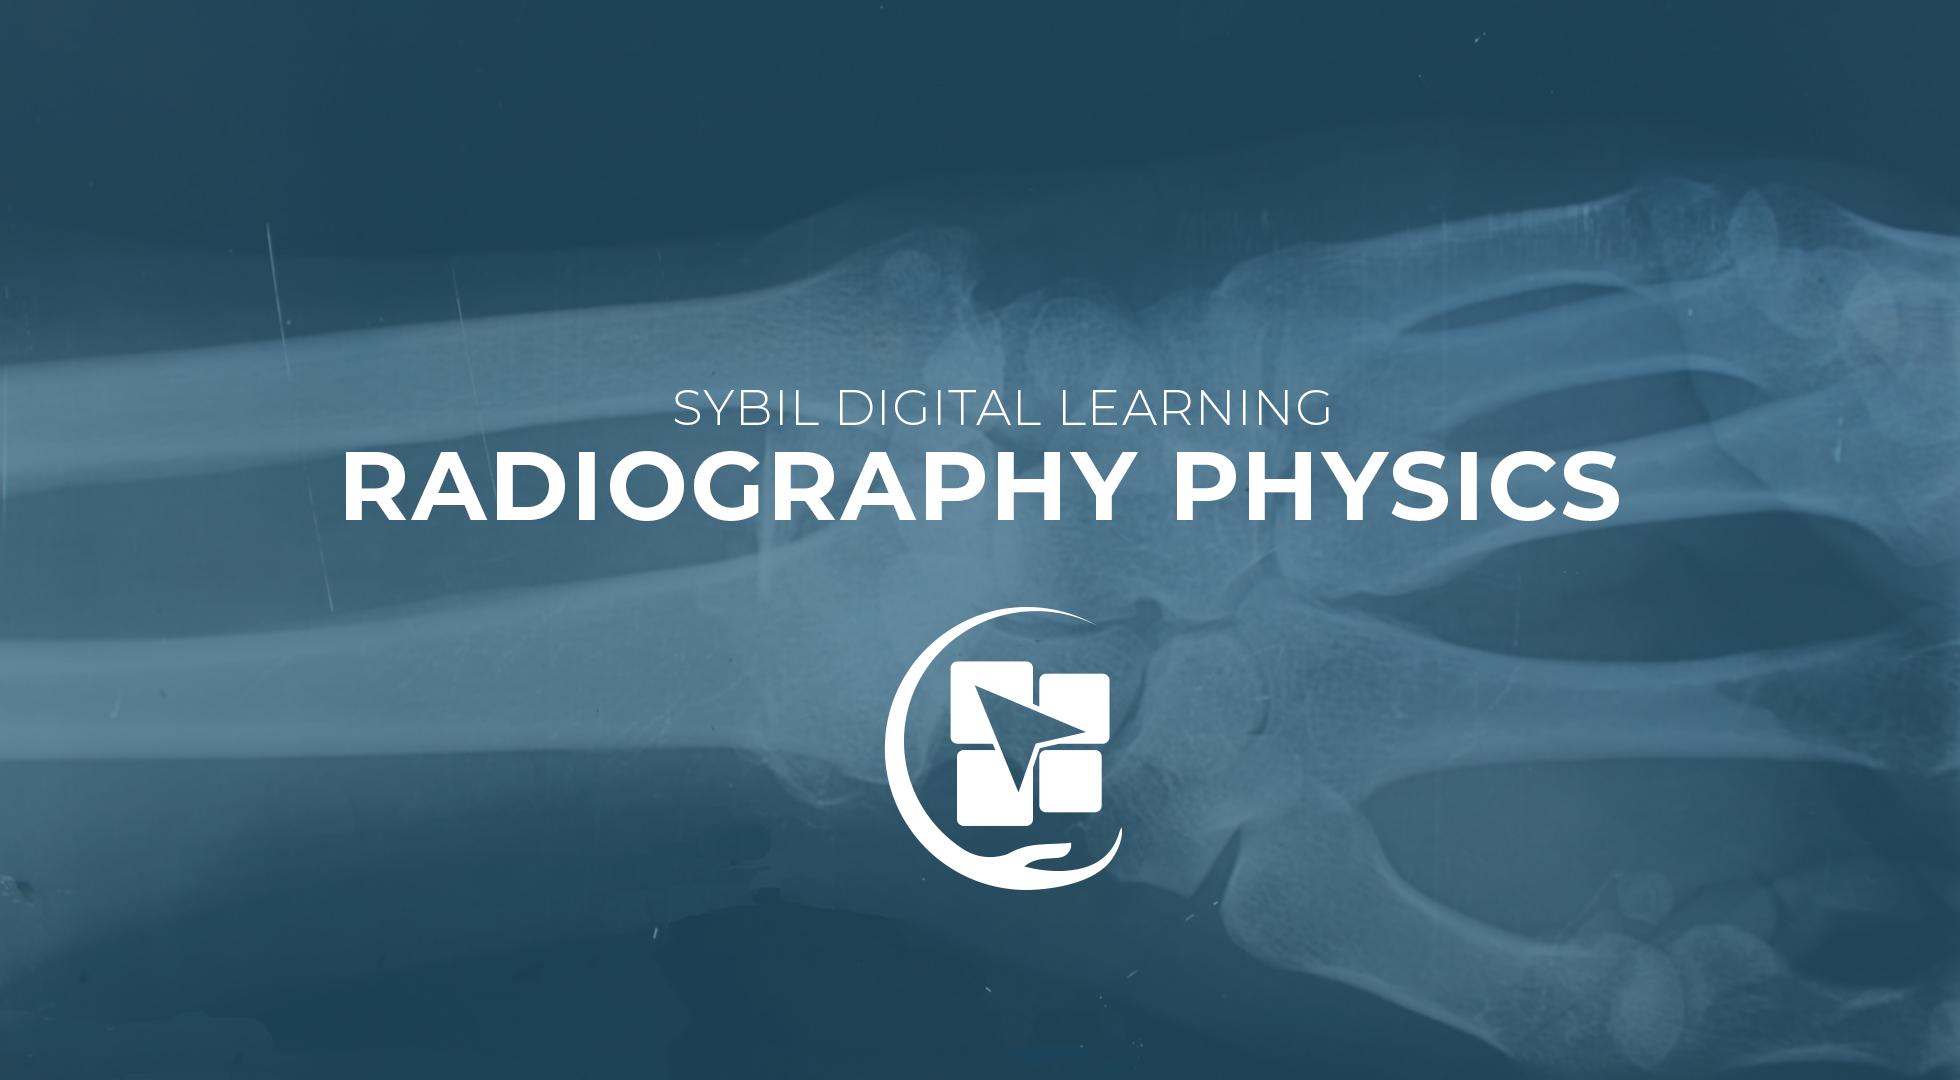 Radiography Physics